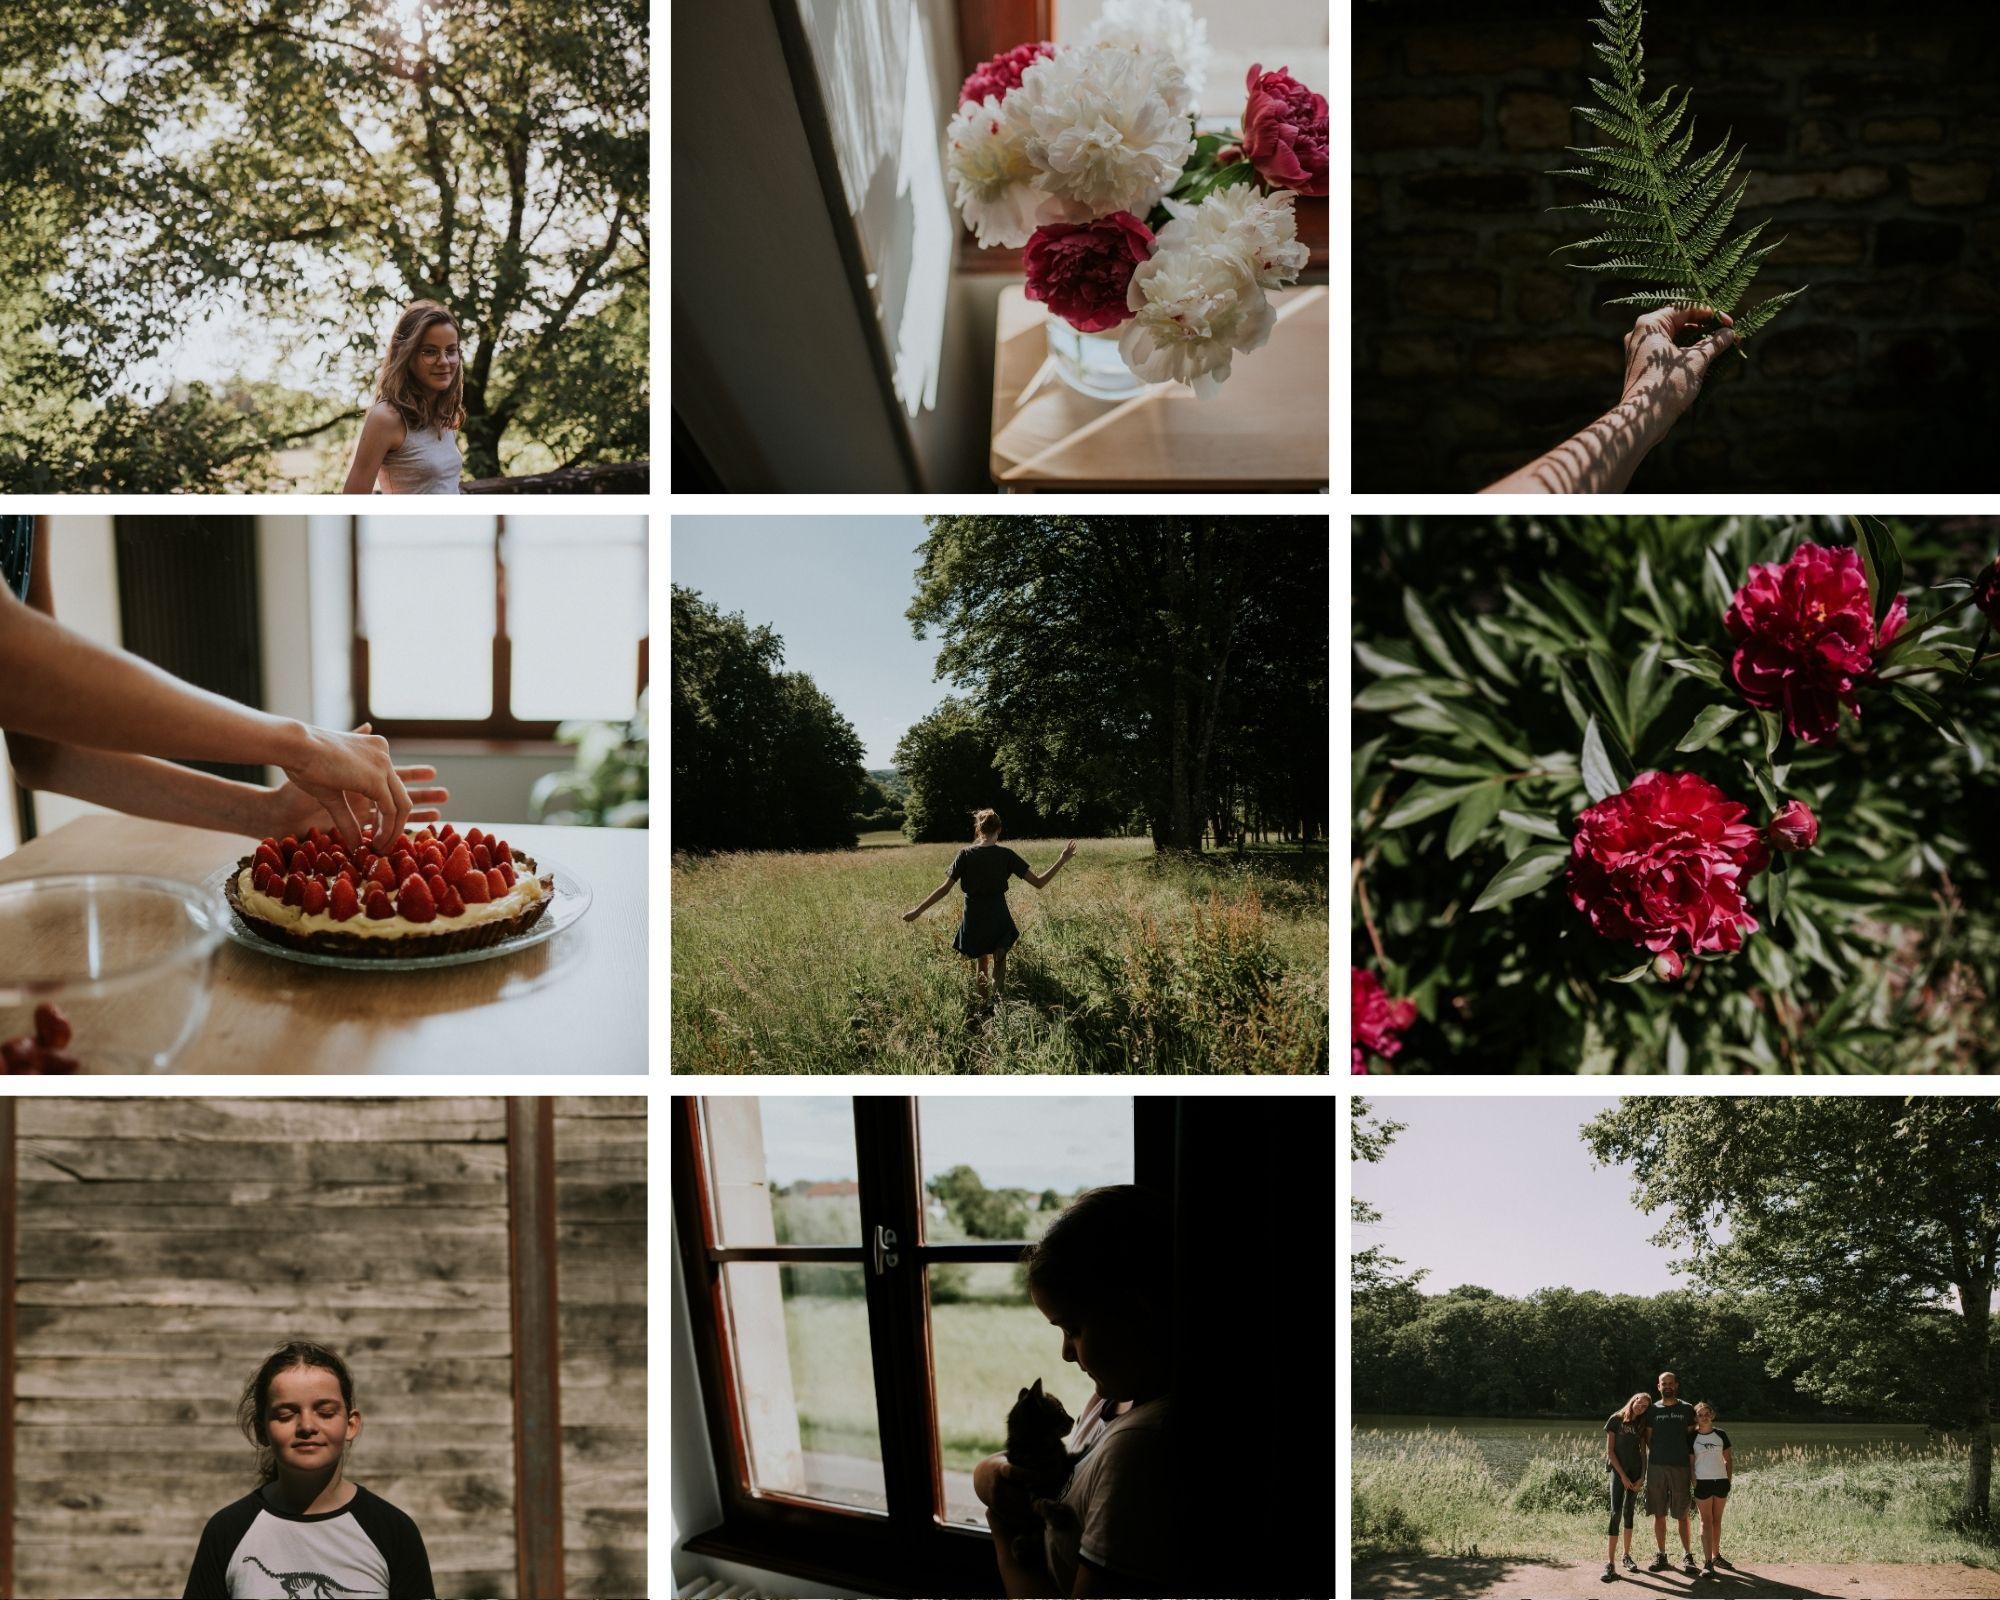 photographe mariage à Epinal